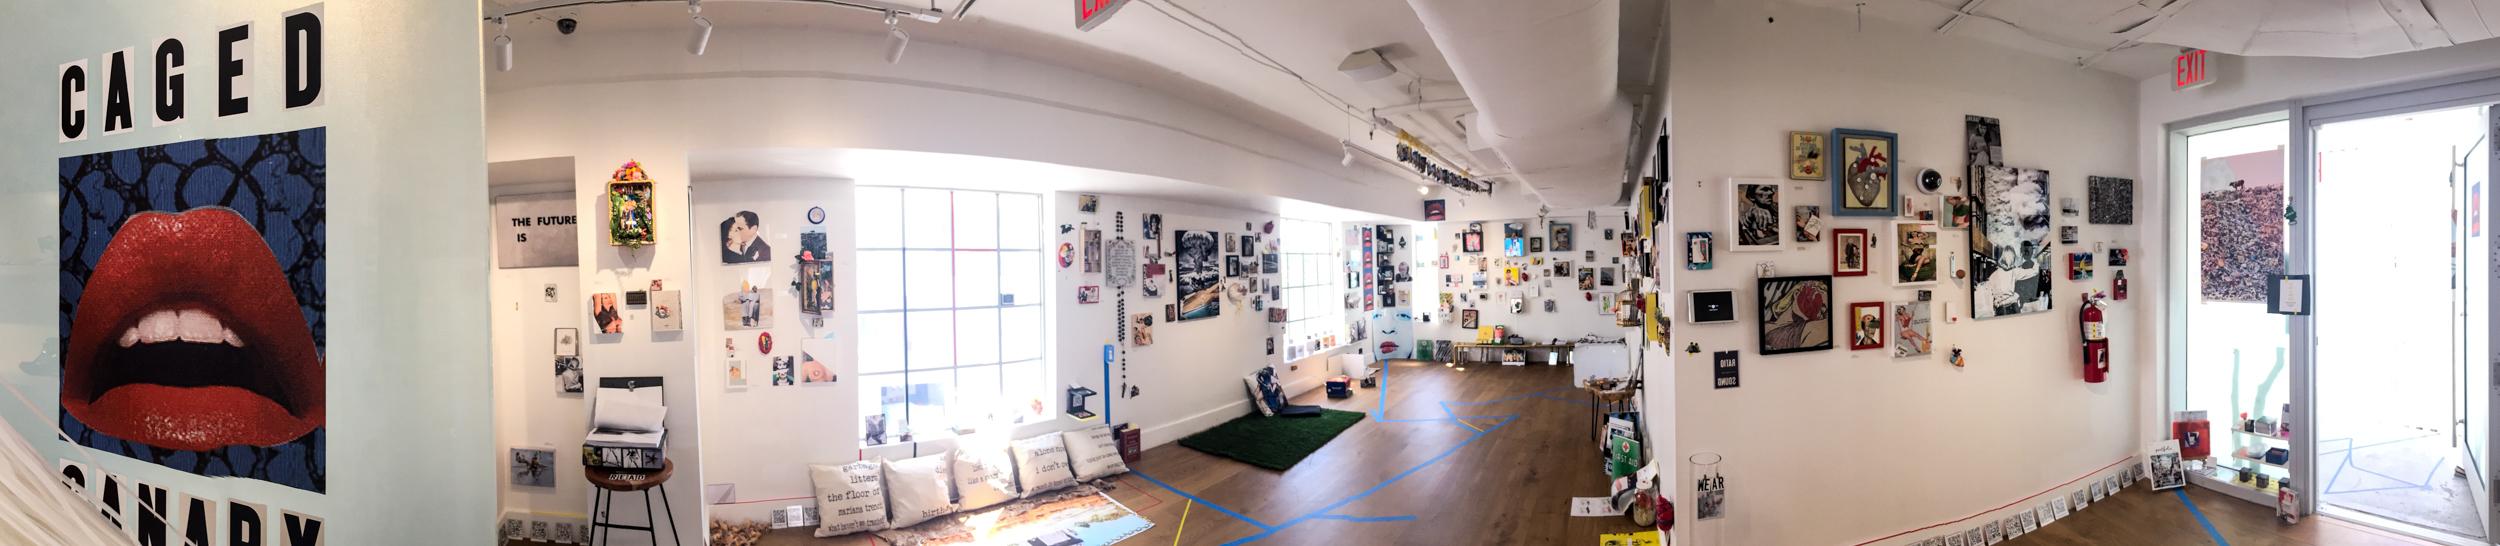 Faena-Exhibition-Images-140.jpg